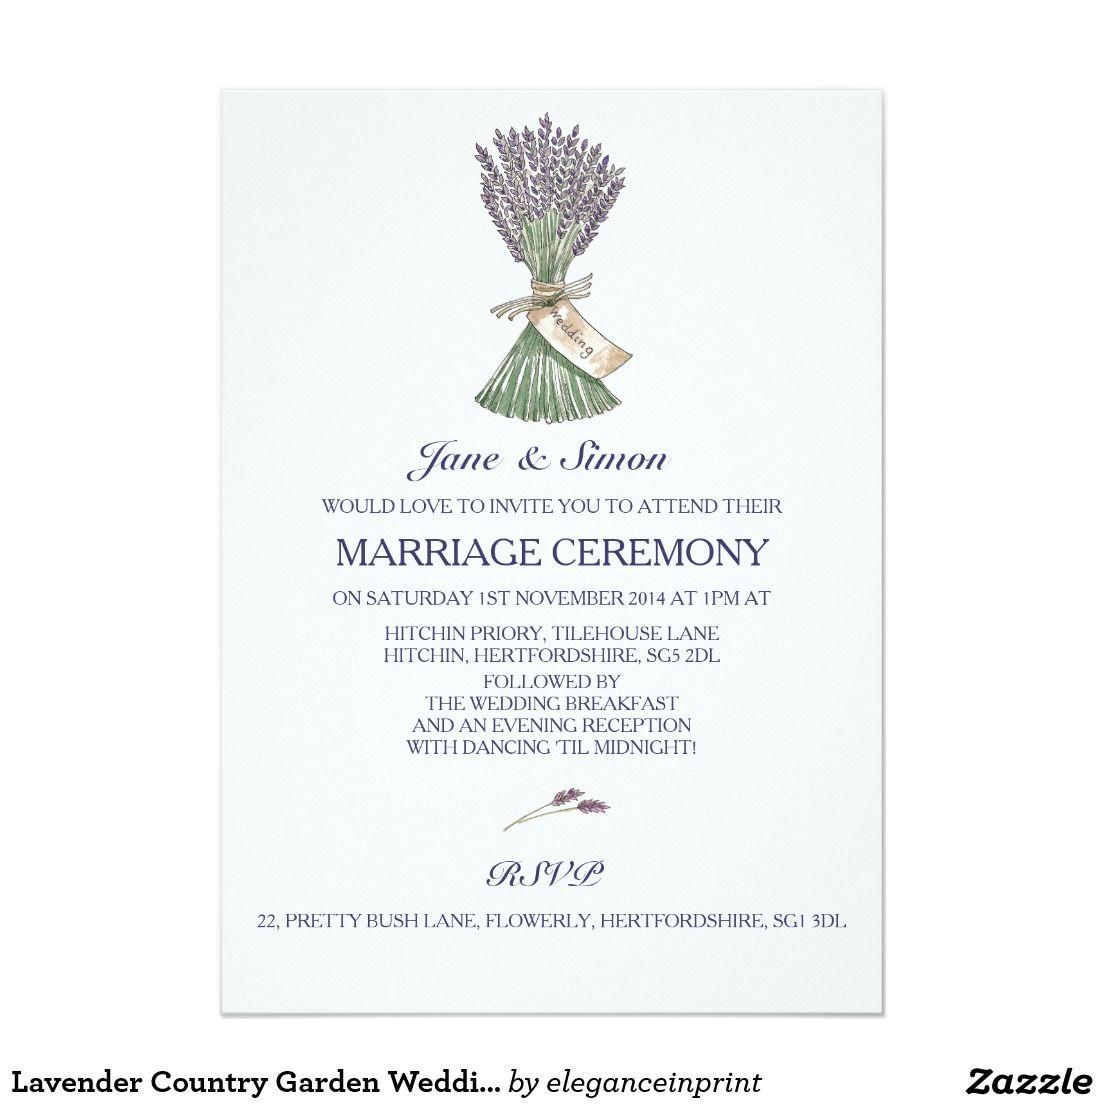 Lavender Country Garden Wedding Invitation